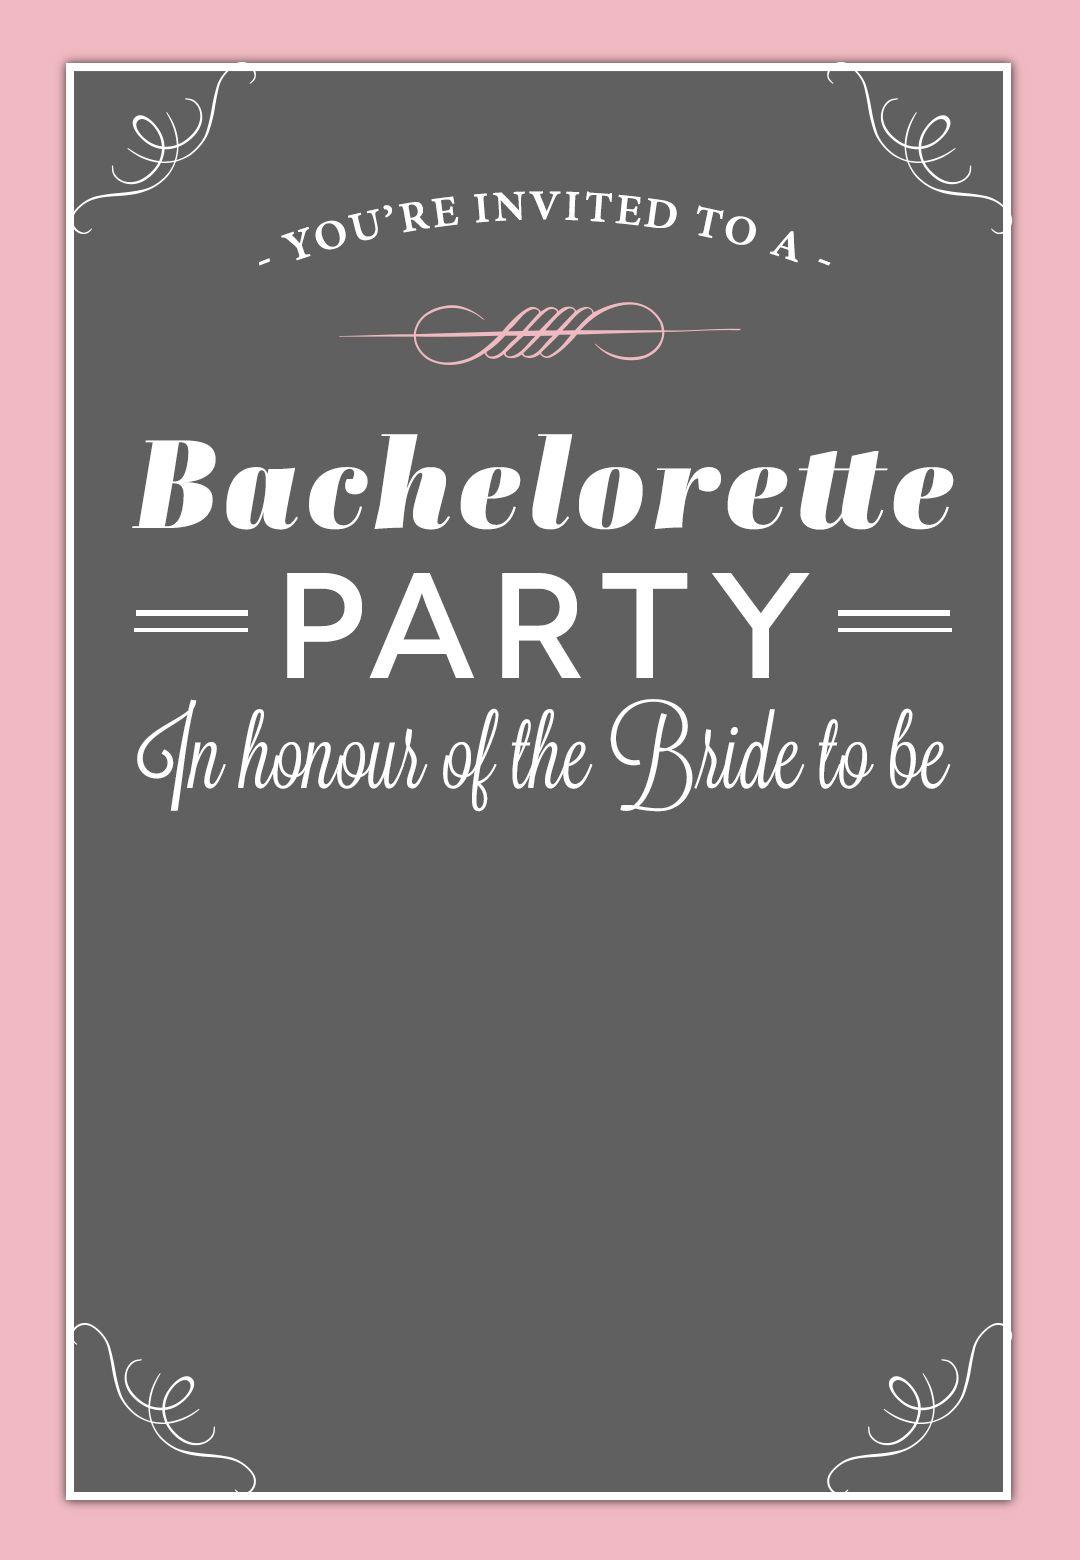 Bachelorette Party #invitation - Free Printable | Free Bachelorette - Free Printable Event Invitations